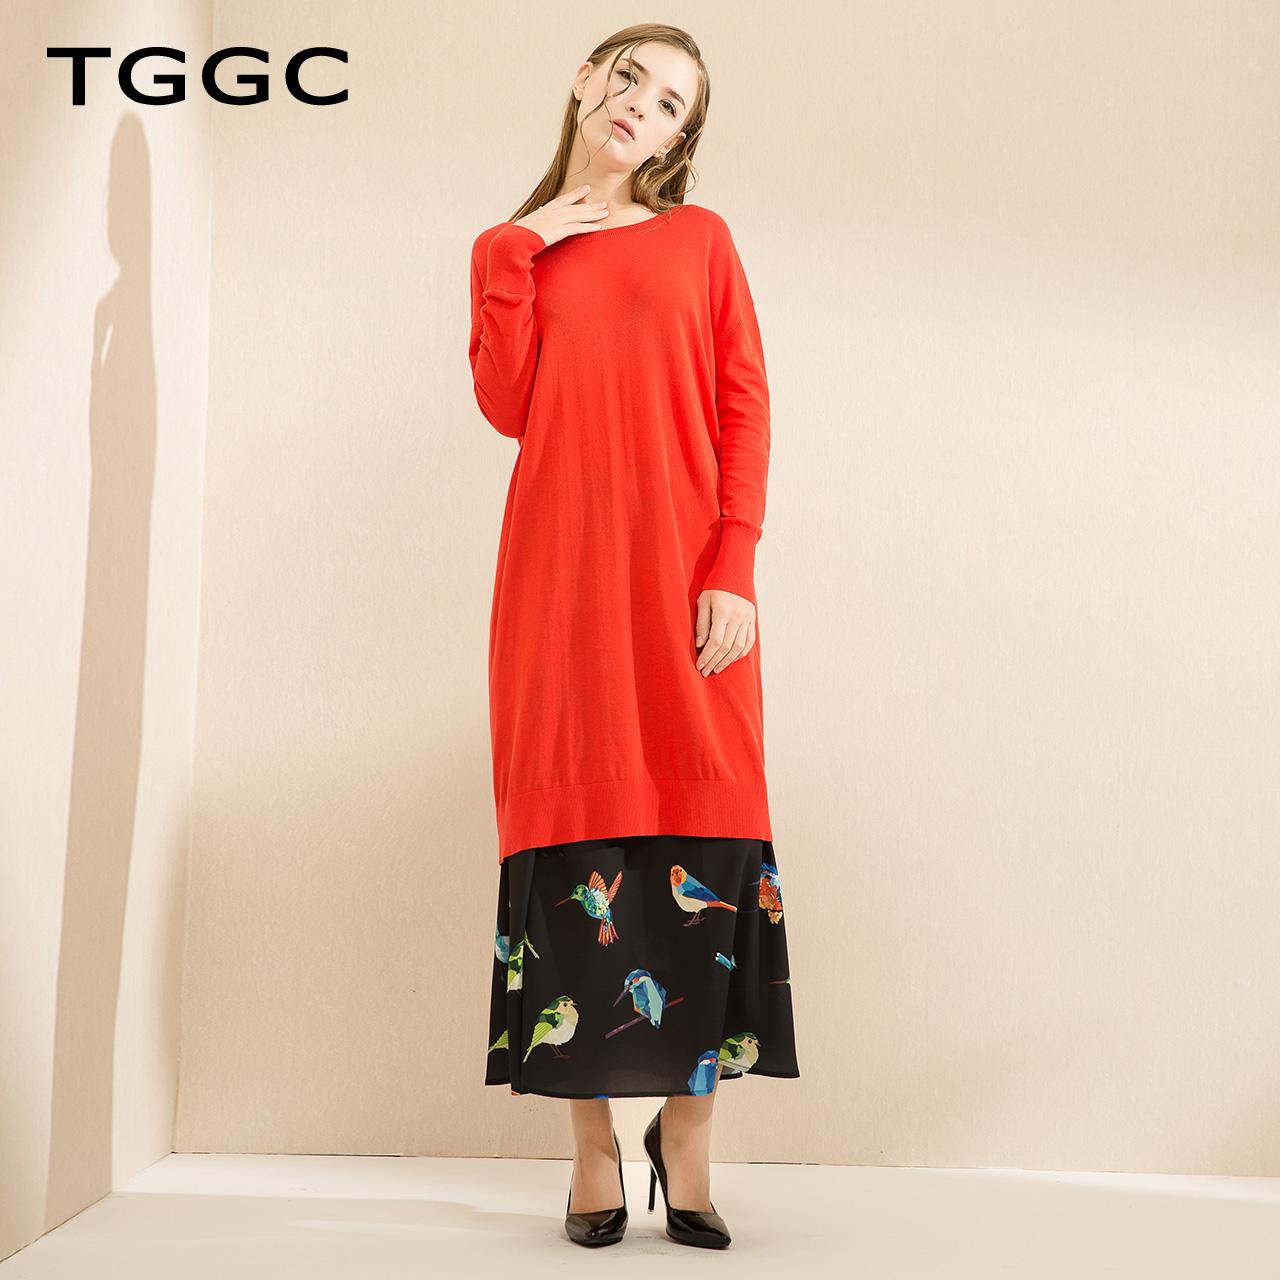 TGGC 2018春装 简约宽松显瘦长袖纯棉中长款针织连衣裙女 F19559